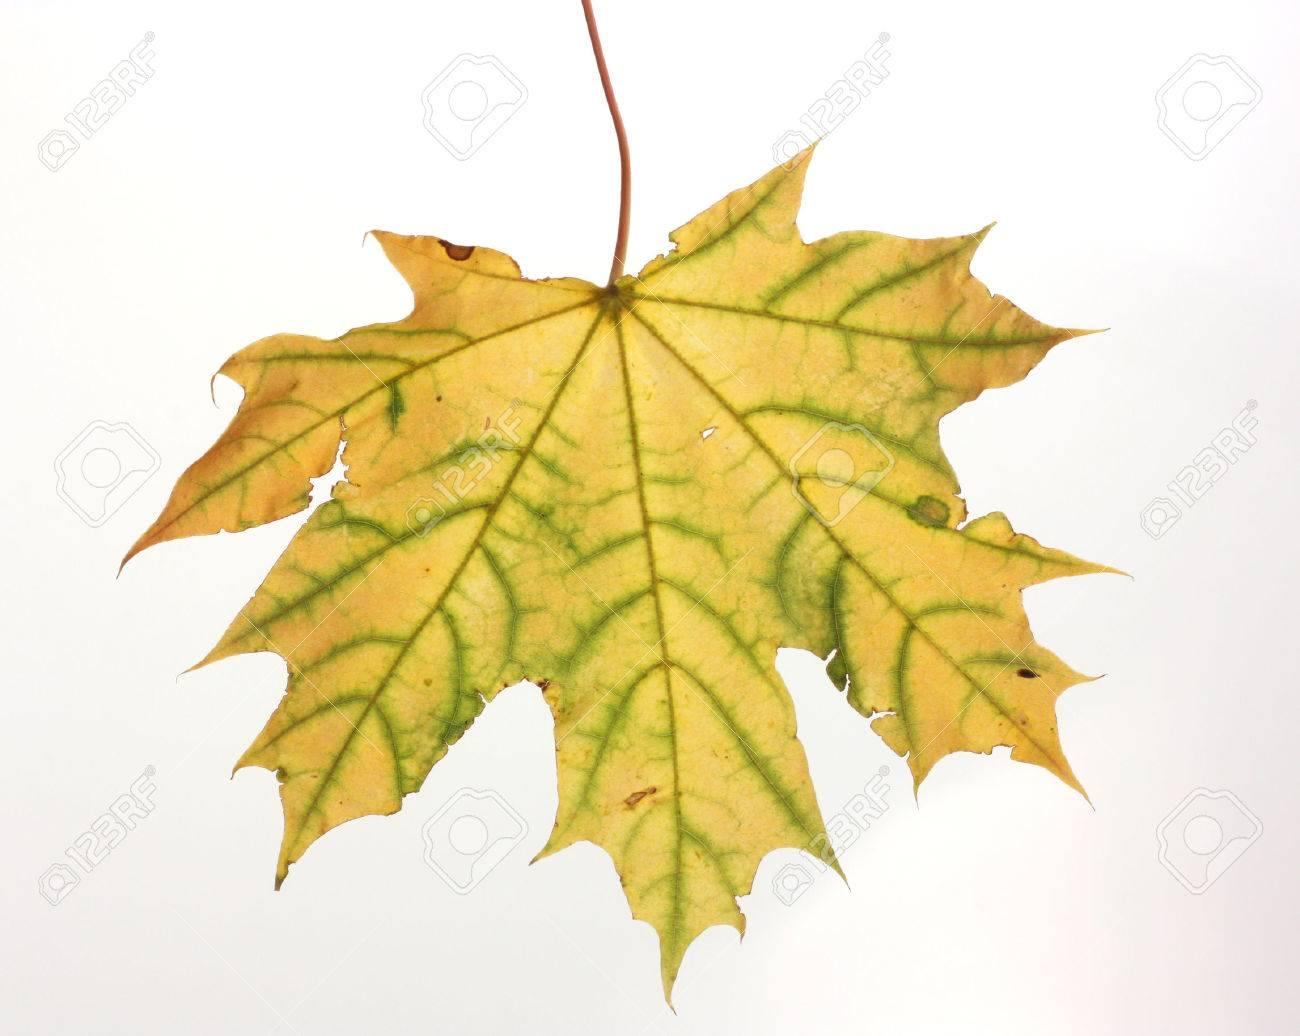 Isolated autumn maple leaf Stock Photo - 23112540